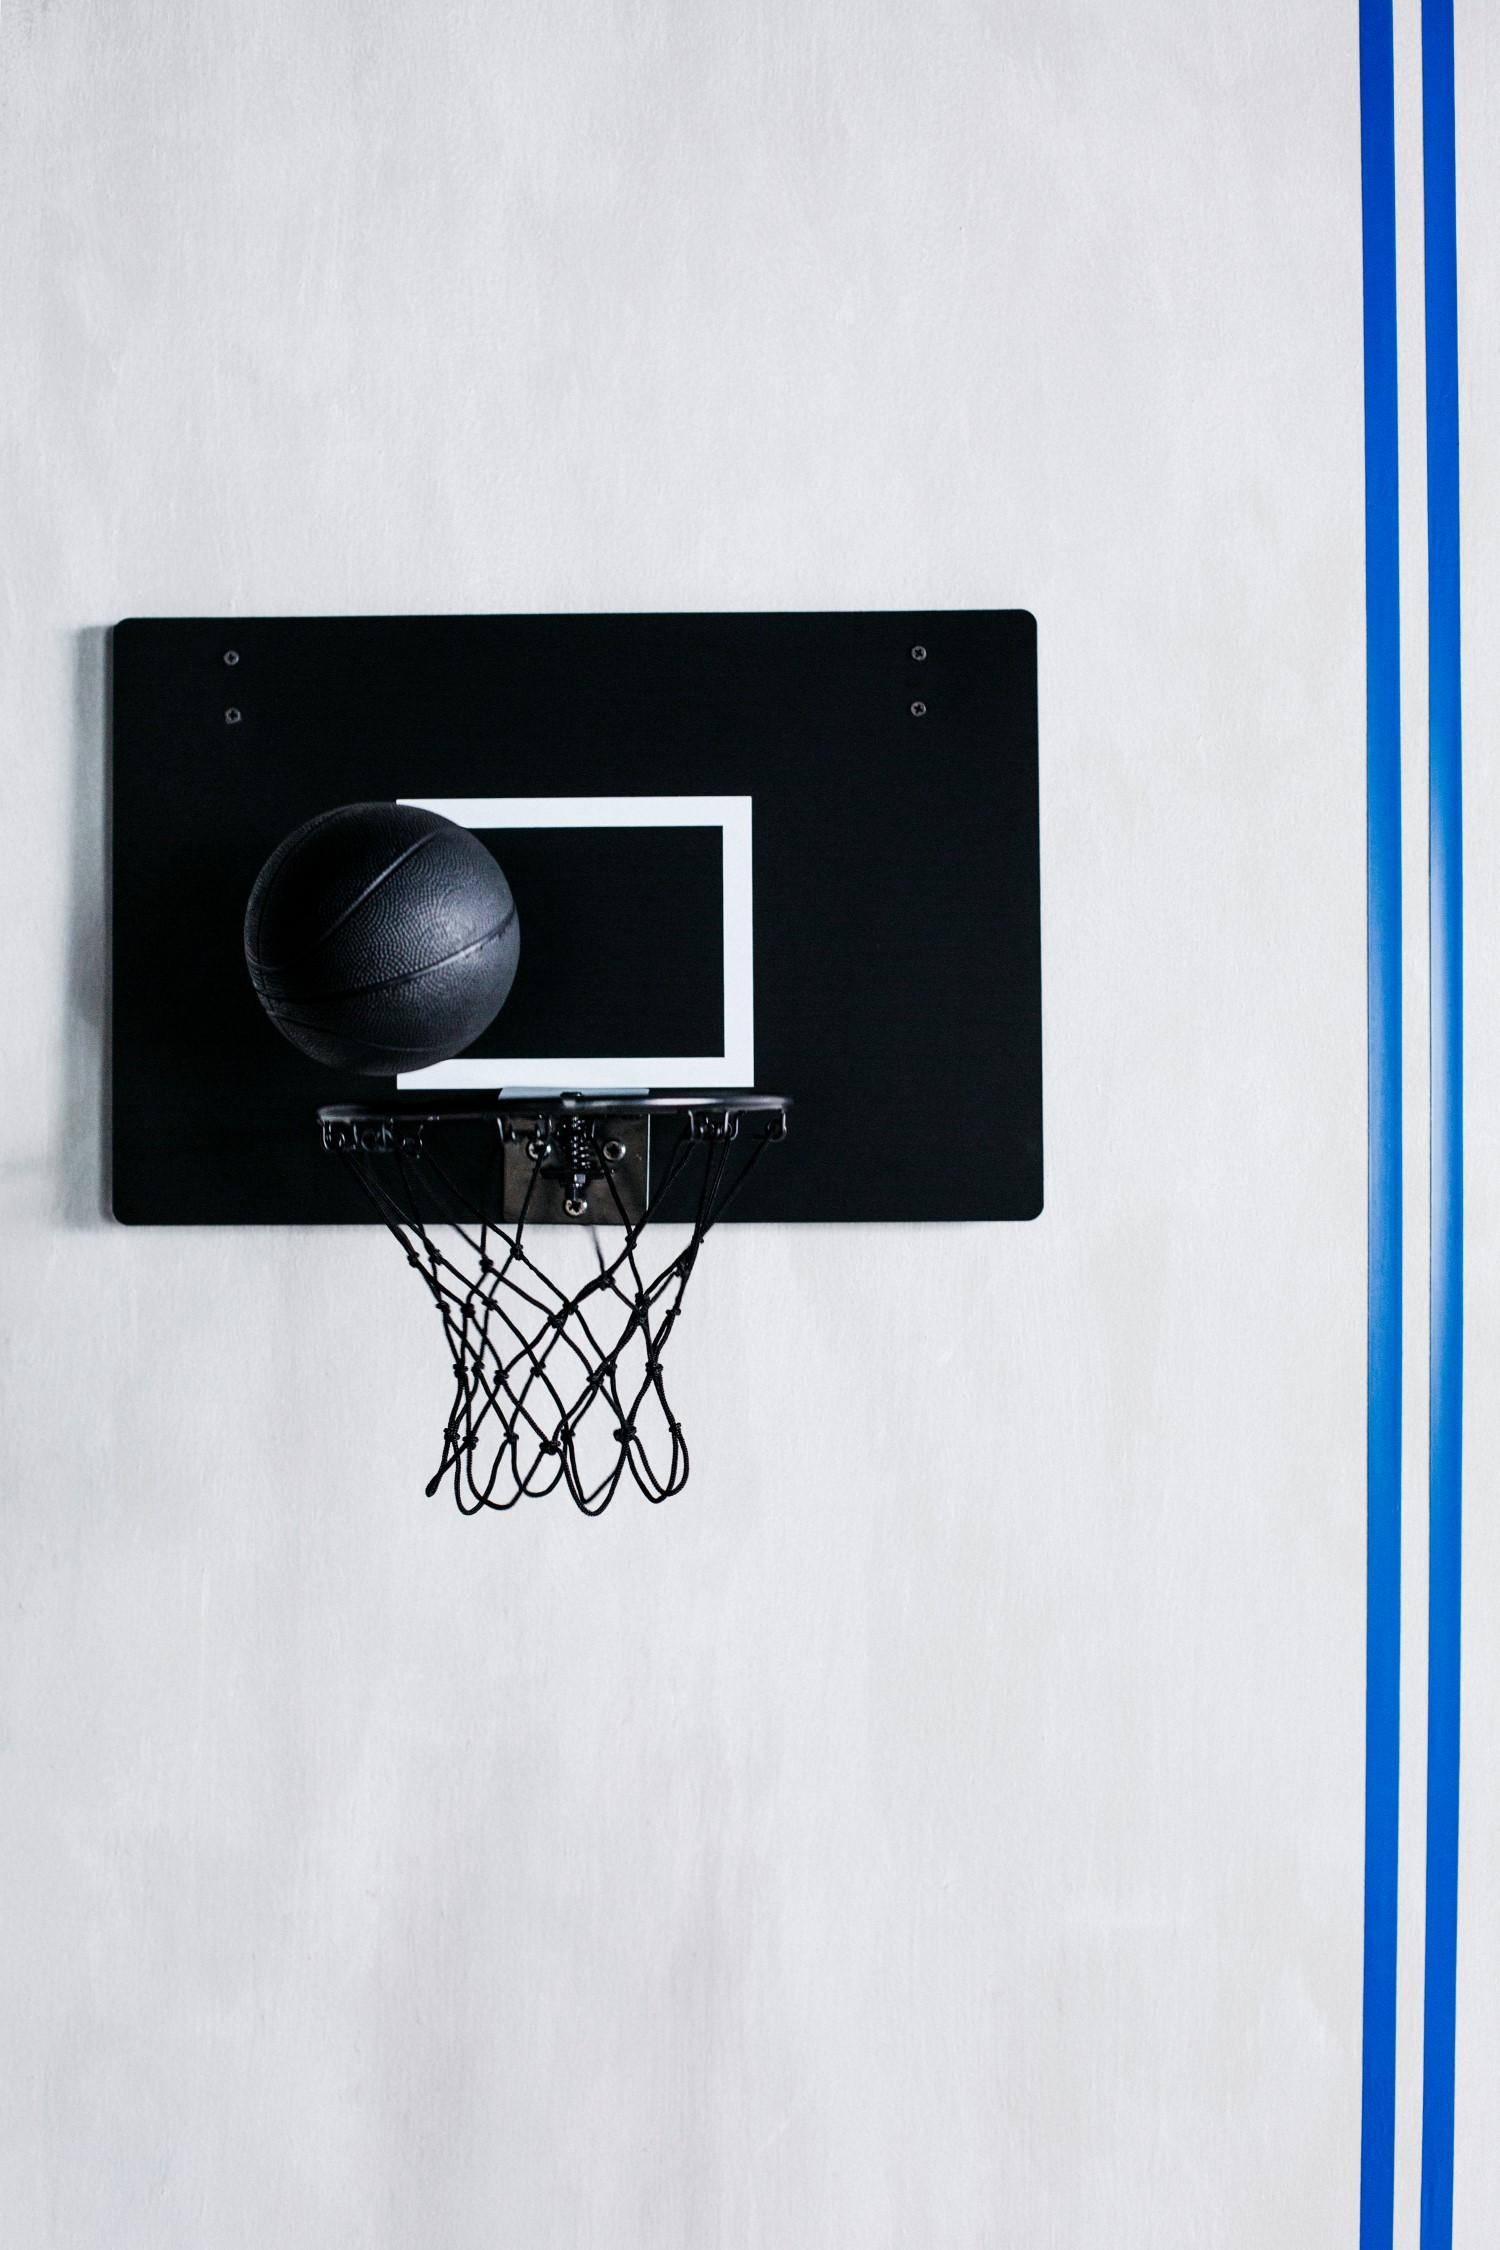 ikea spanst basketball on the net